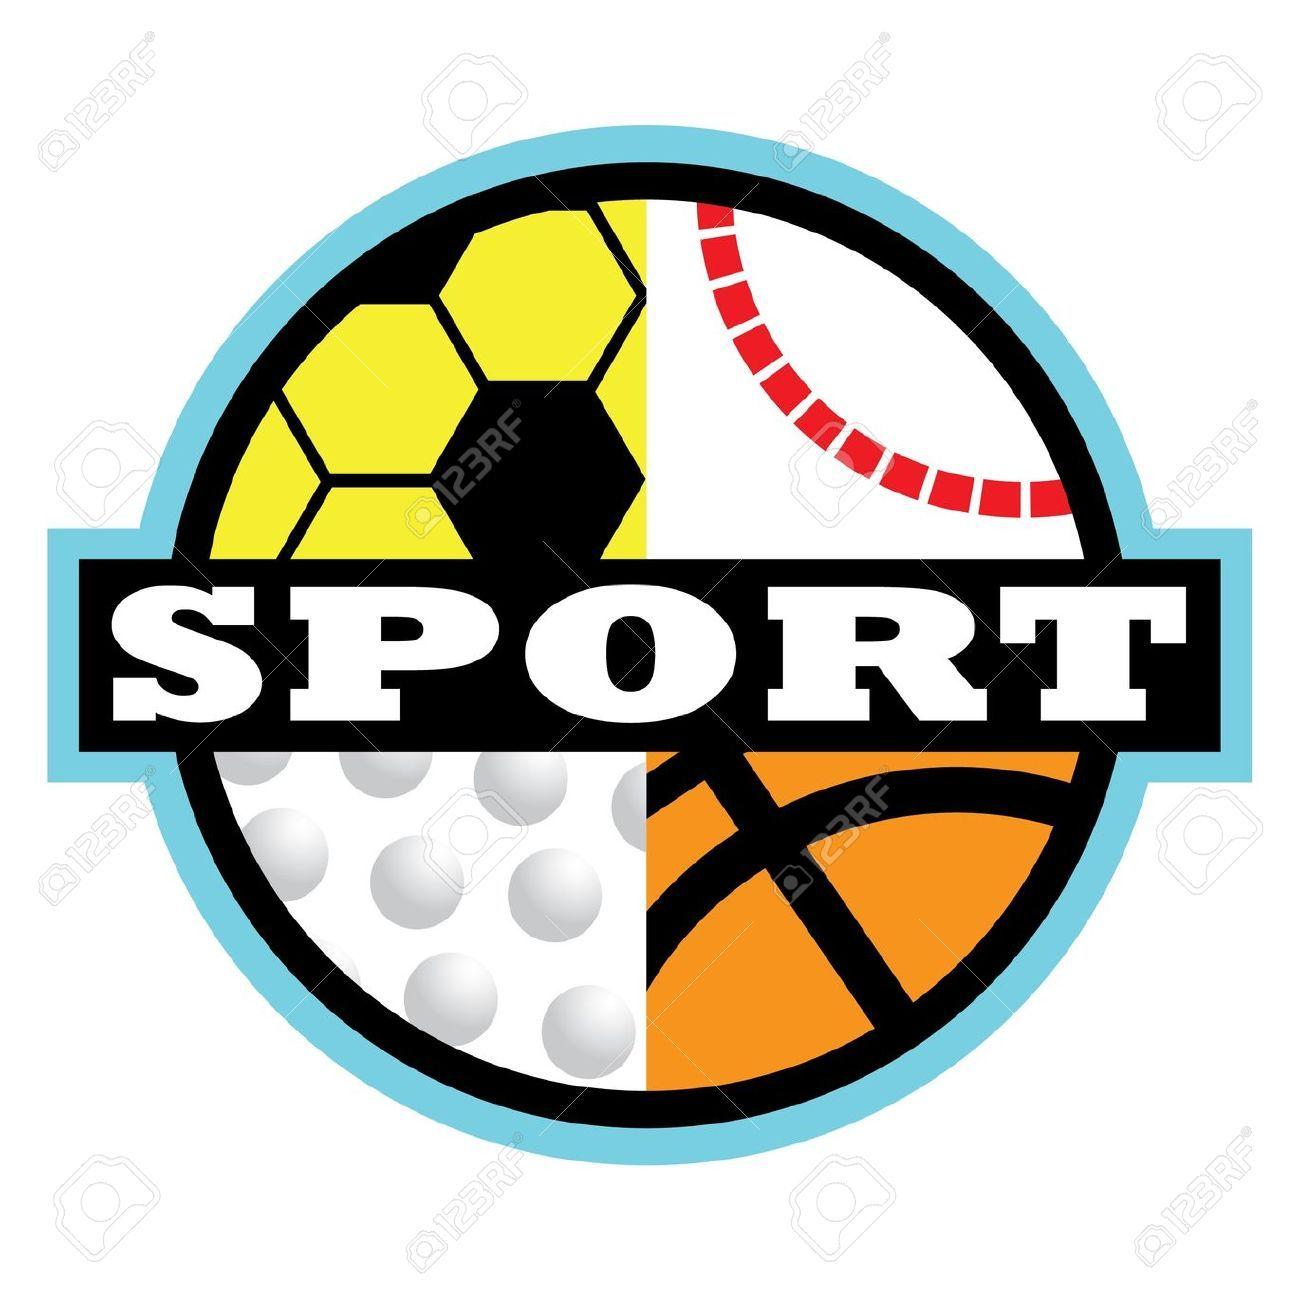 allsportz365 The World Of All Sports Sports logo